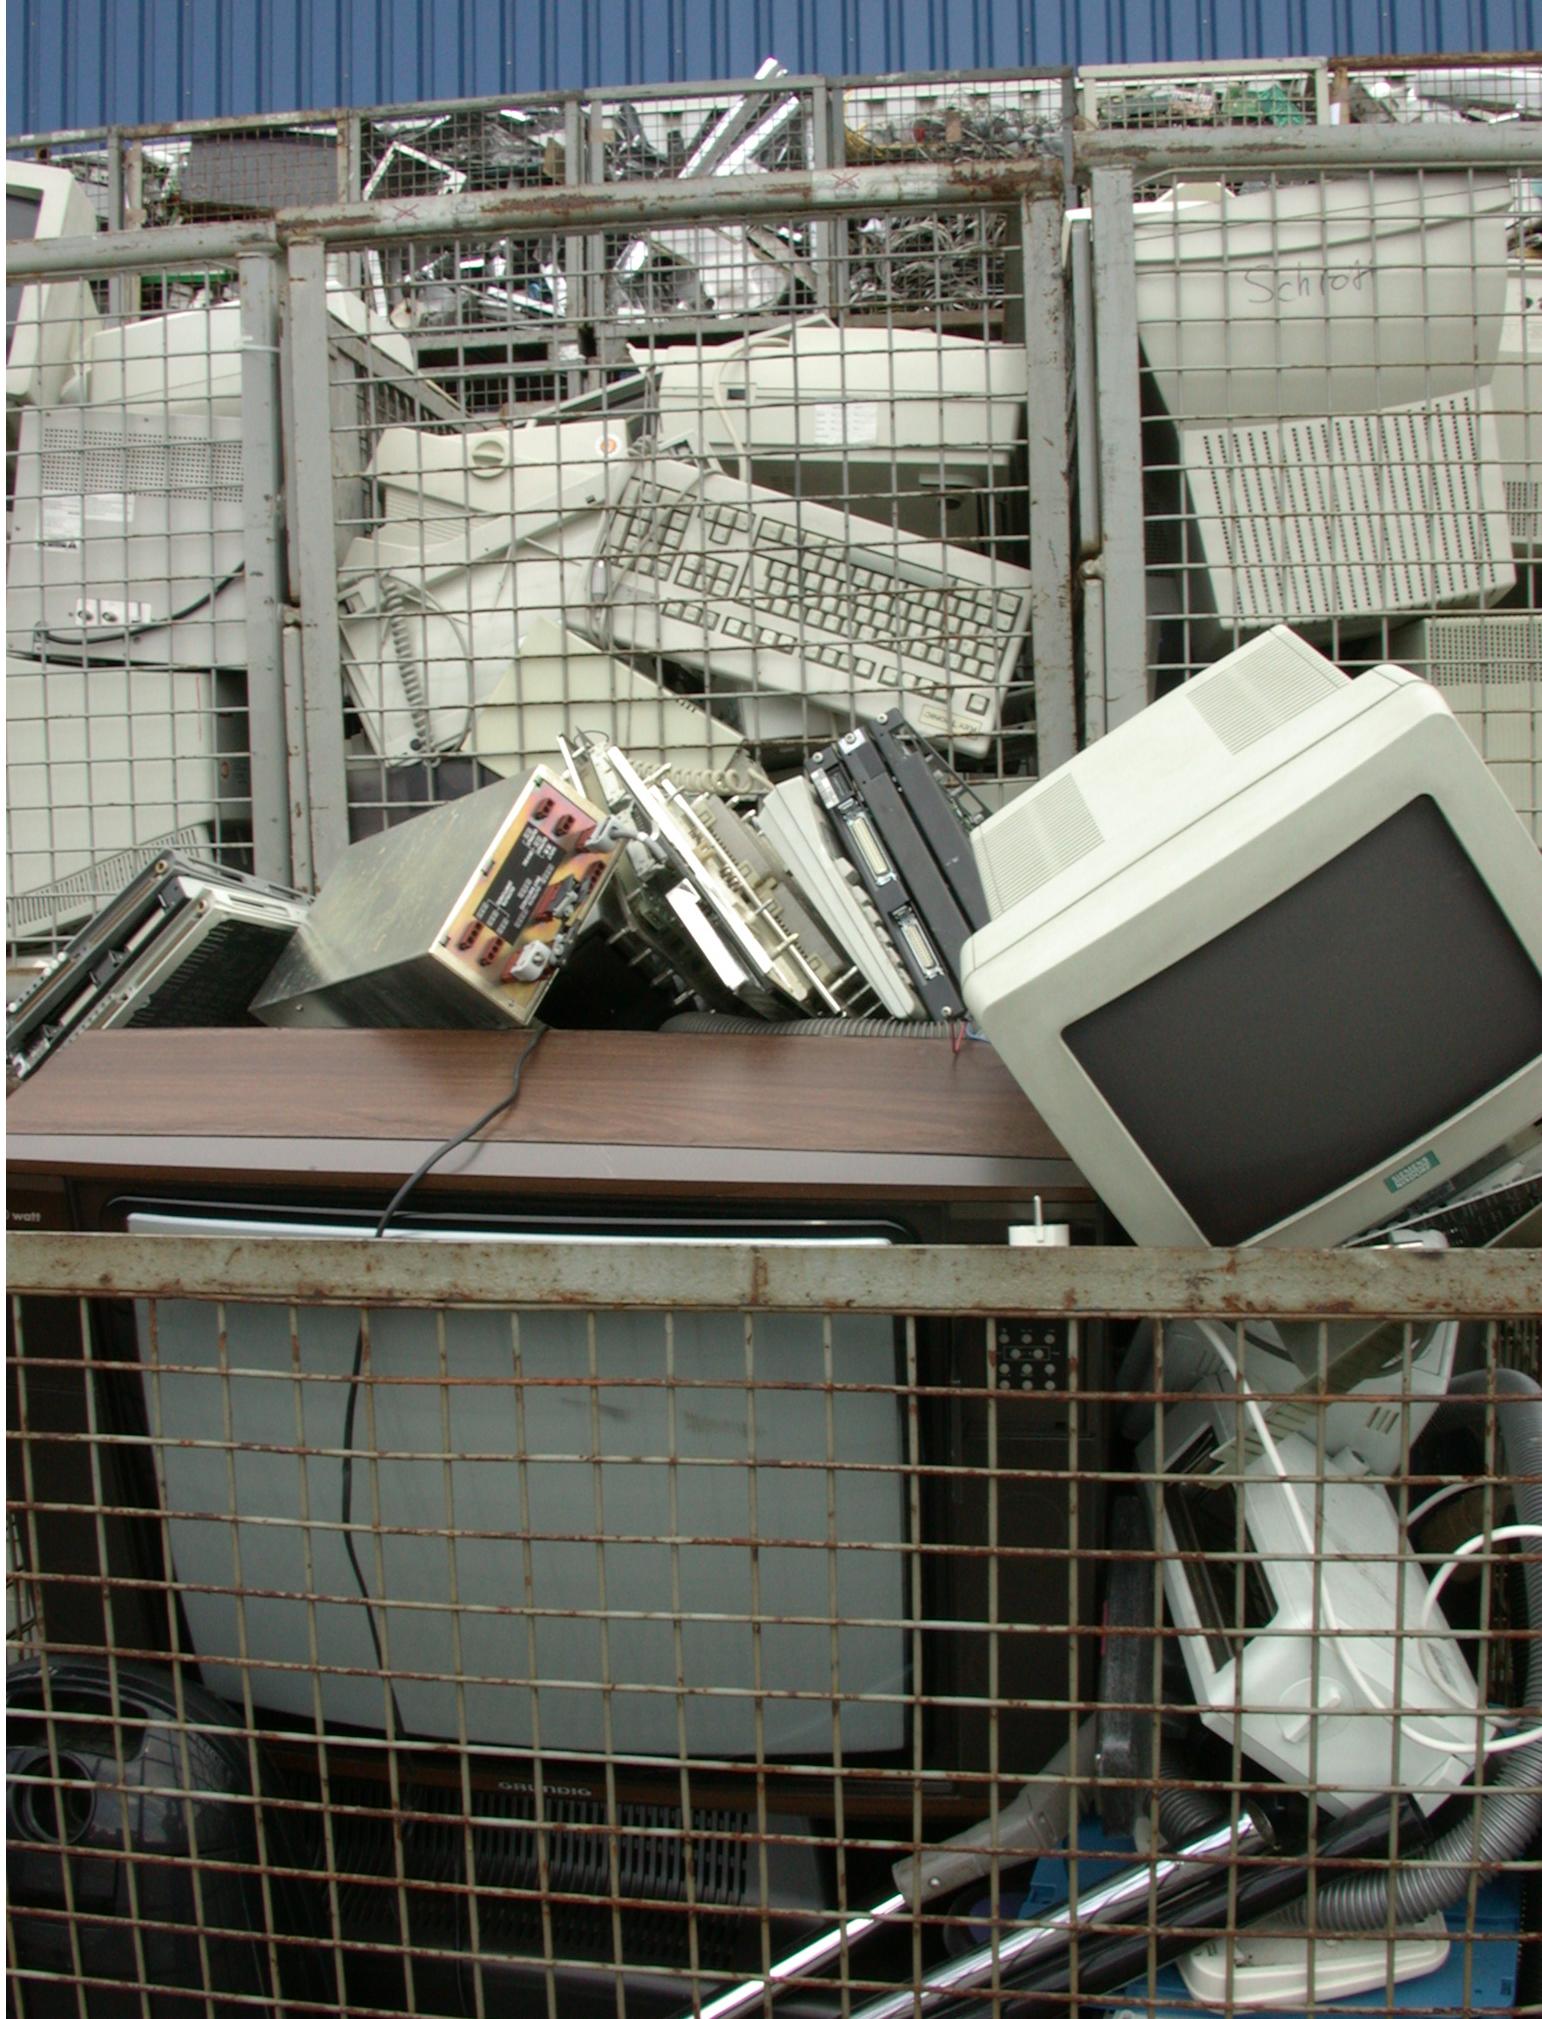 http://upload.wikimedia.org/wikipedia/commons/3/34/Computerschrott.jpg